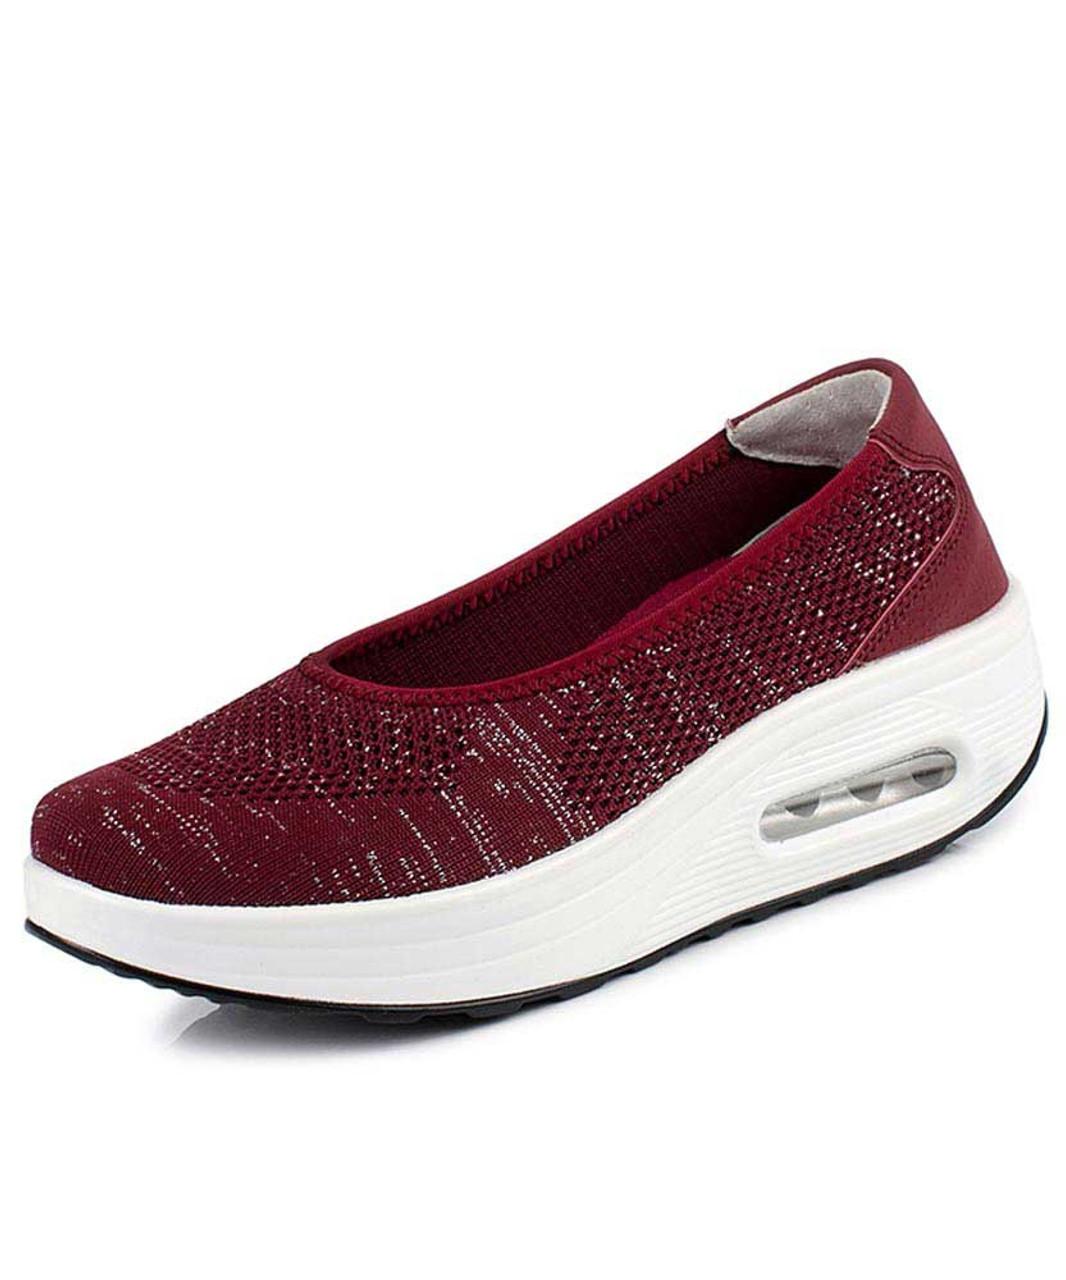 official photos 474cc d209f Red low cut texture slip on rocker bottom shoe sneaker